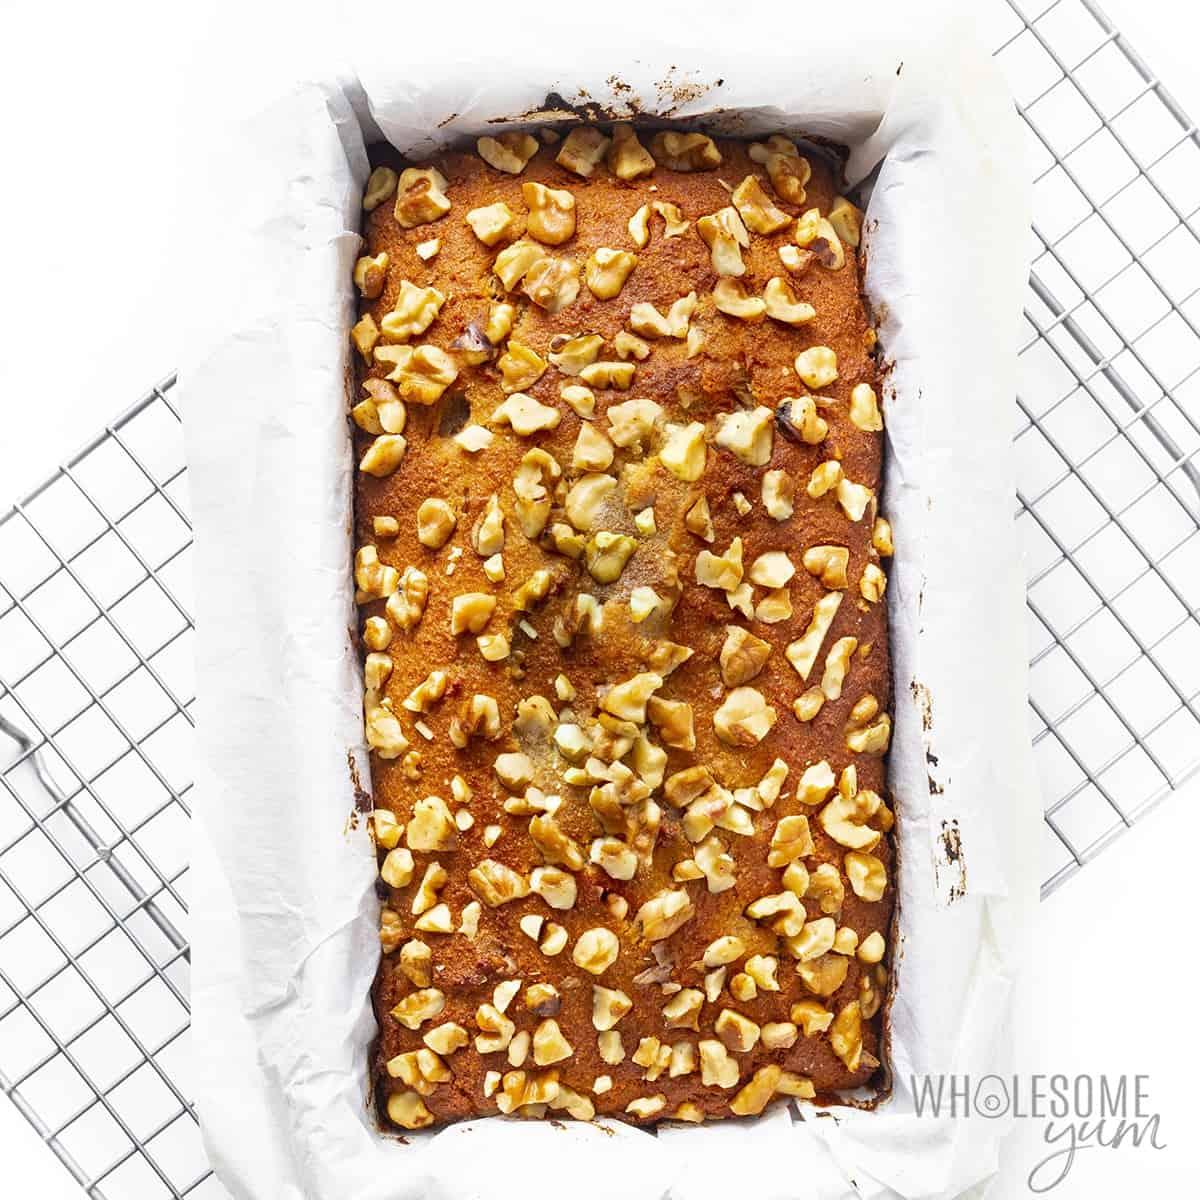 Sugar free banana bread in loaf pan